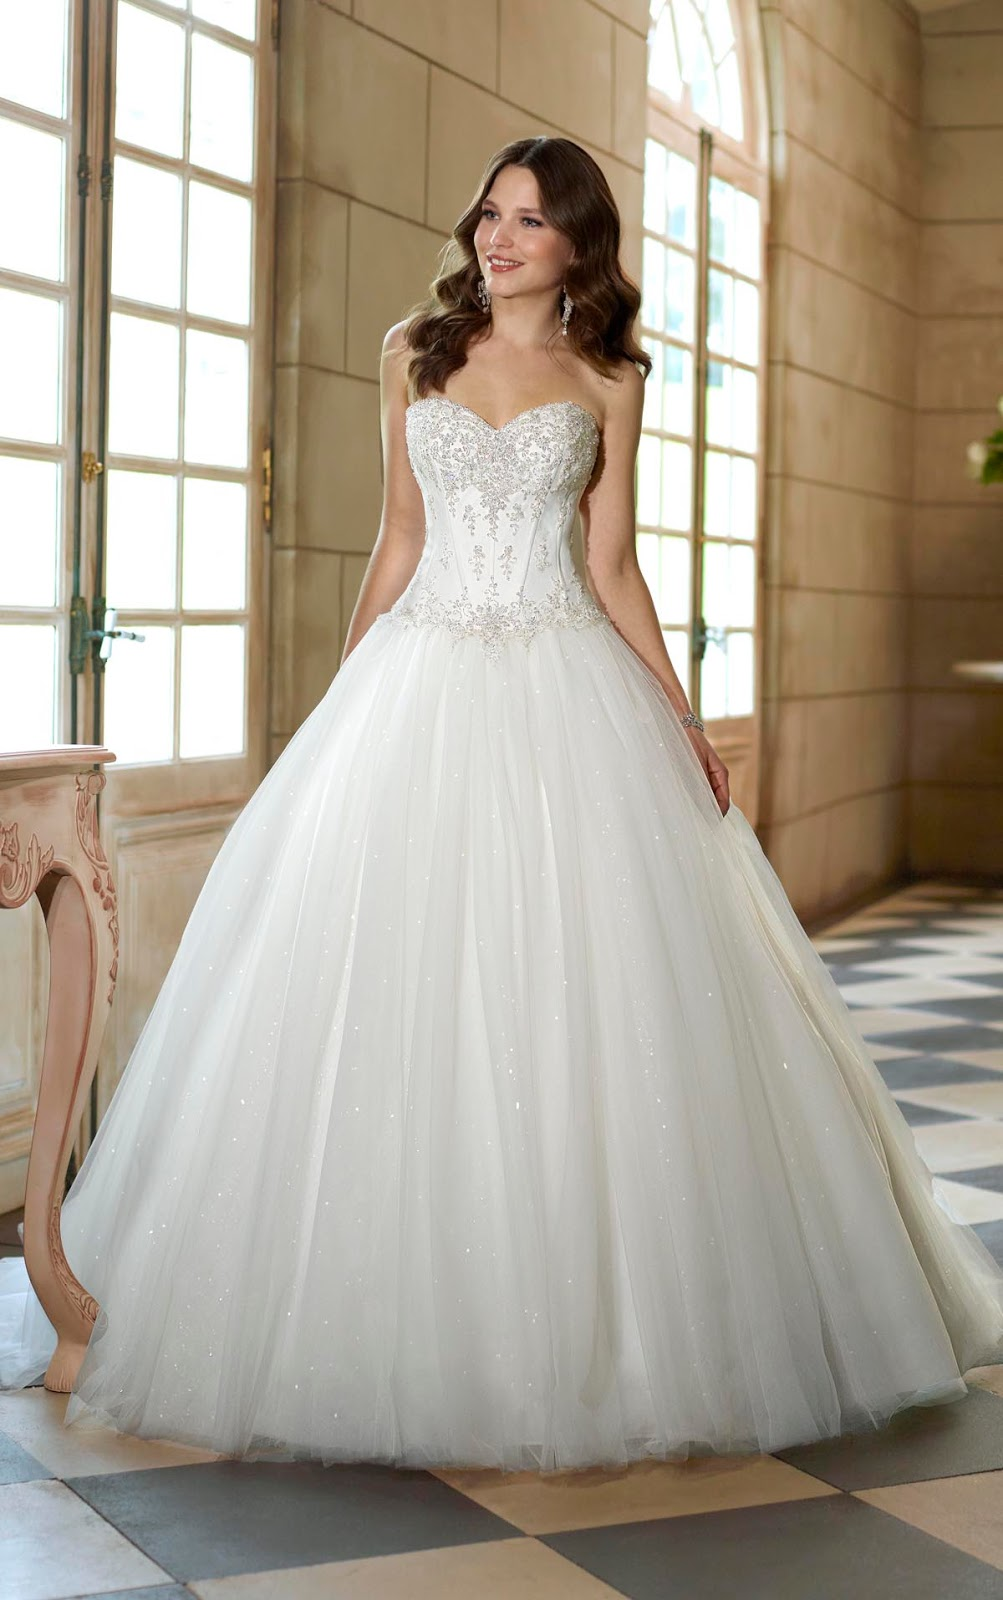 Wearing White To A Wedding.2015 Autumn And Winter White Beautiful Wedding Dress